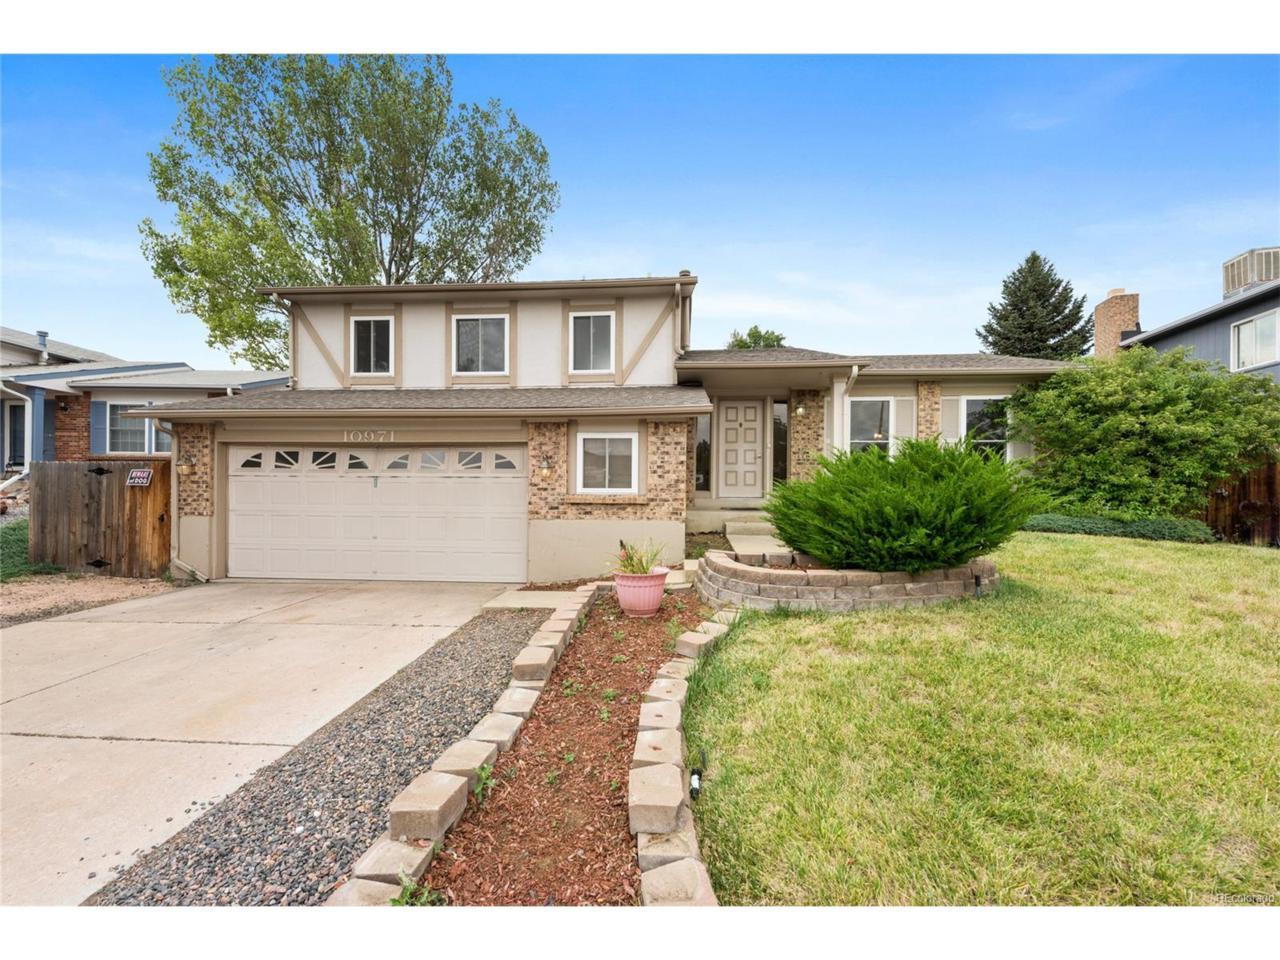 10971 Newland Street, Westminster, CO 80020 (MLS #3967239) :: 8z Real Estate